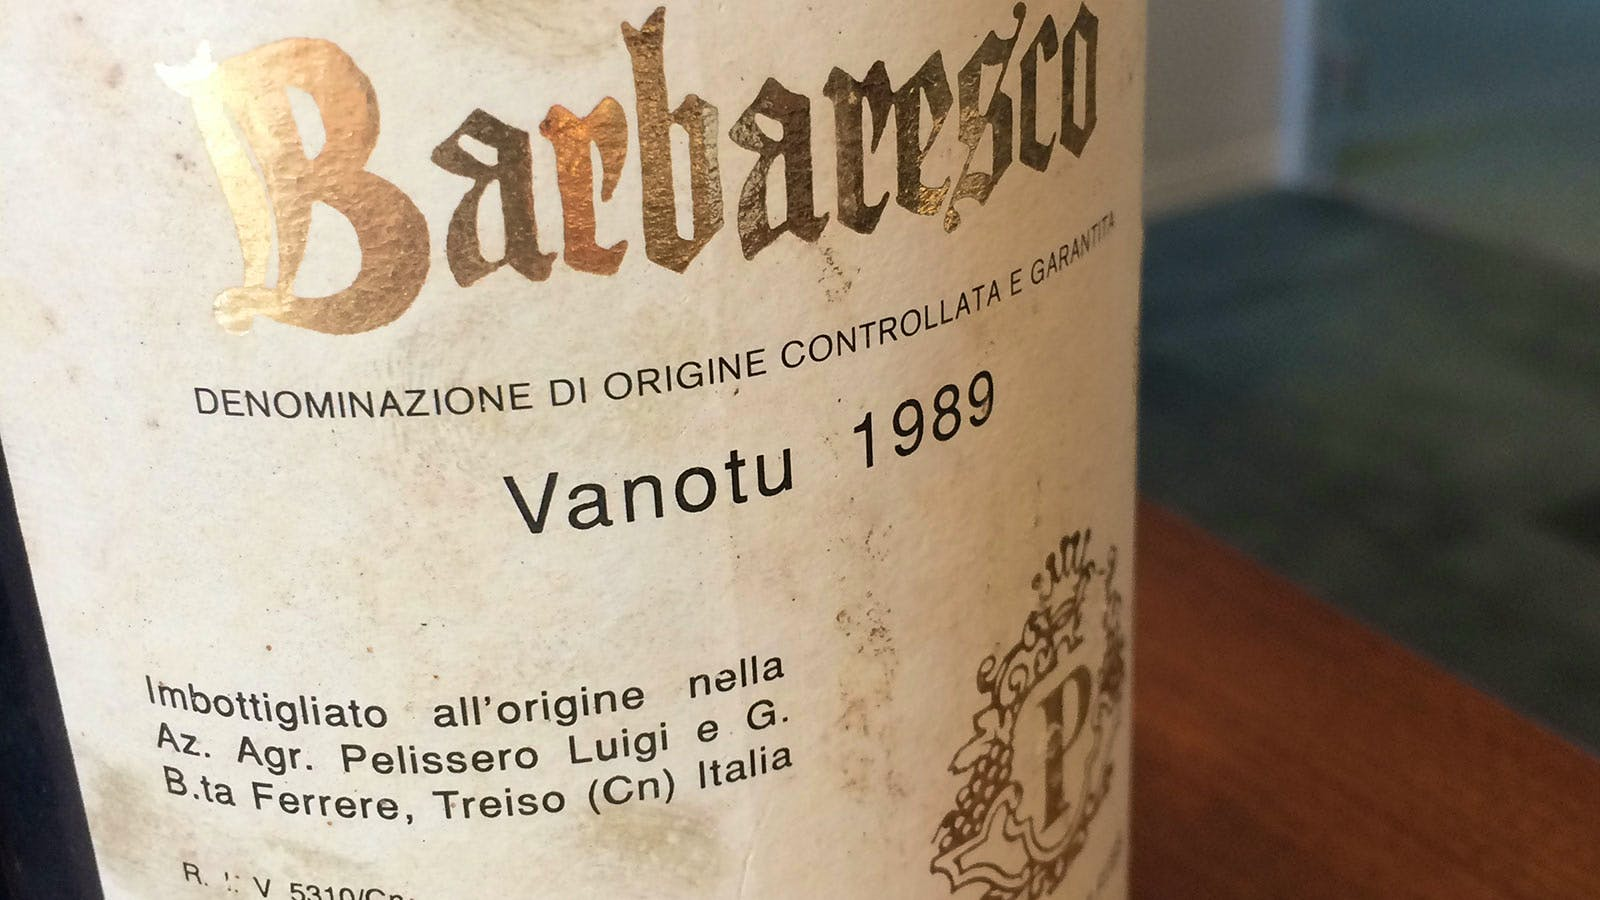 A Vertical Tasting of Pelissero's Vanotu Barbaresco